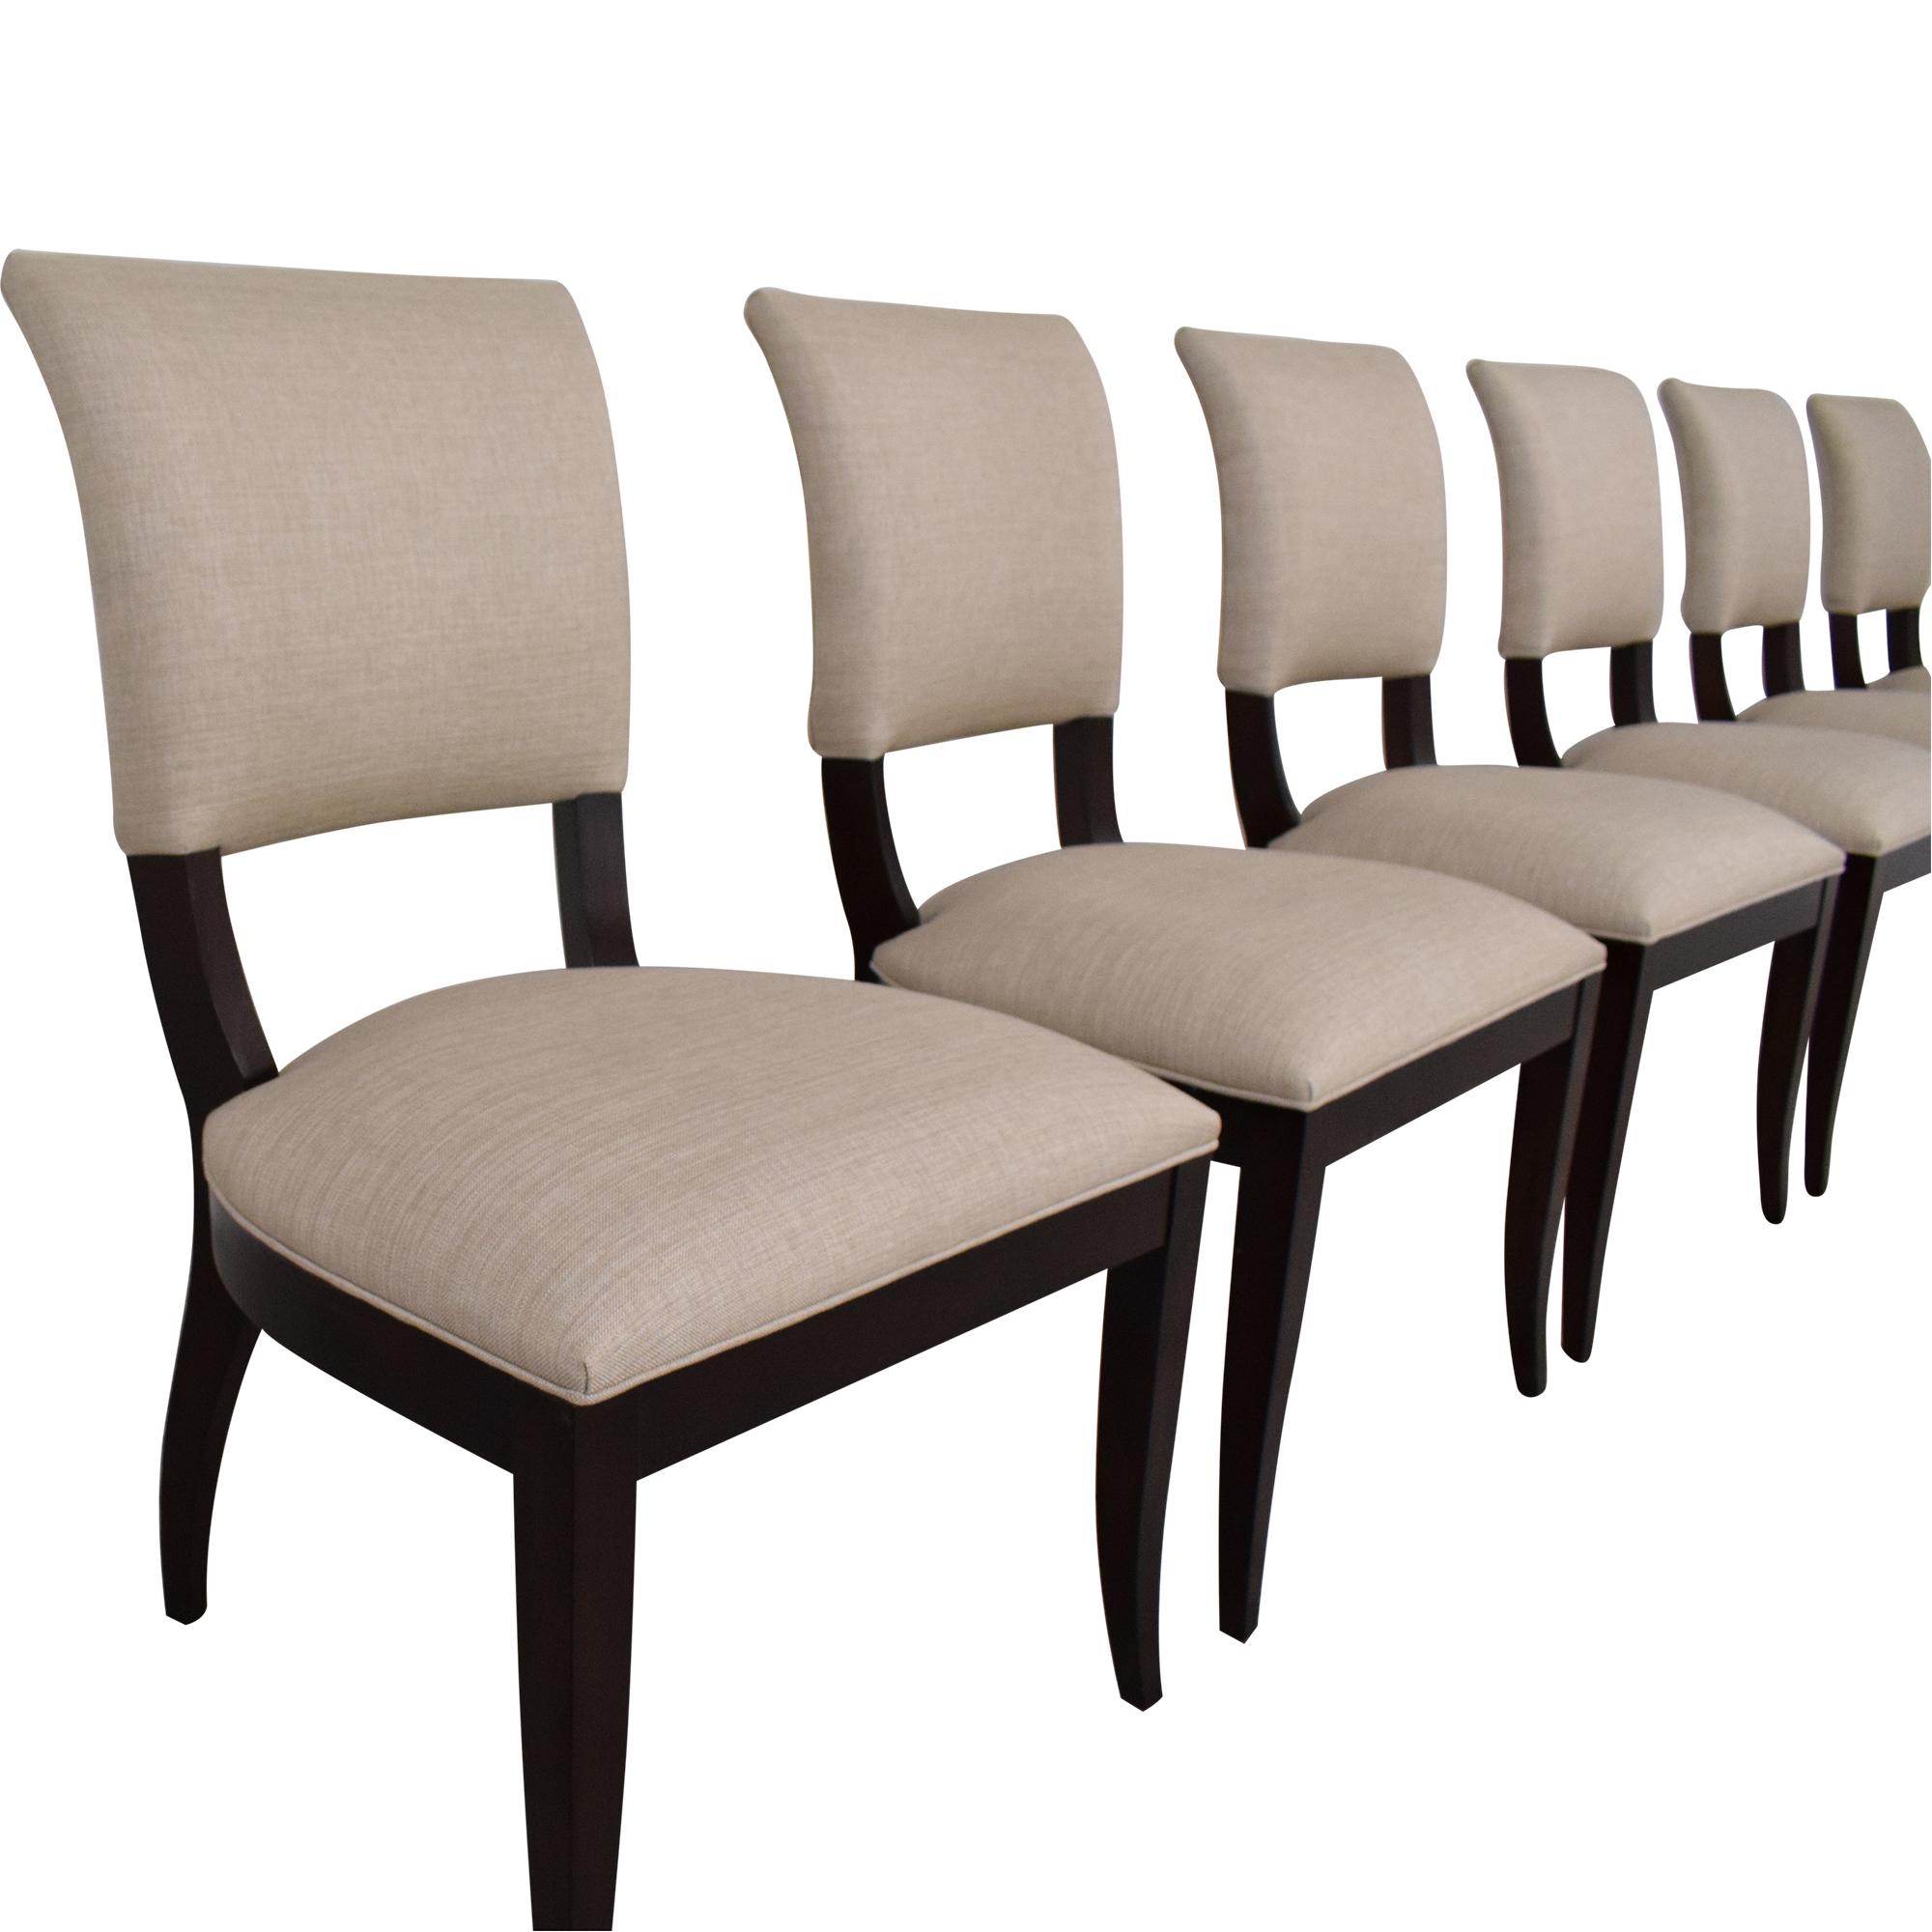 Ethan Allen Ethan Allen Drew Side Chairs for sale